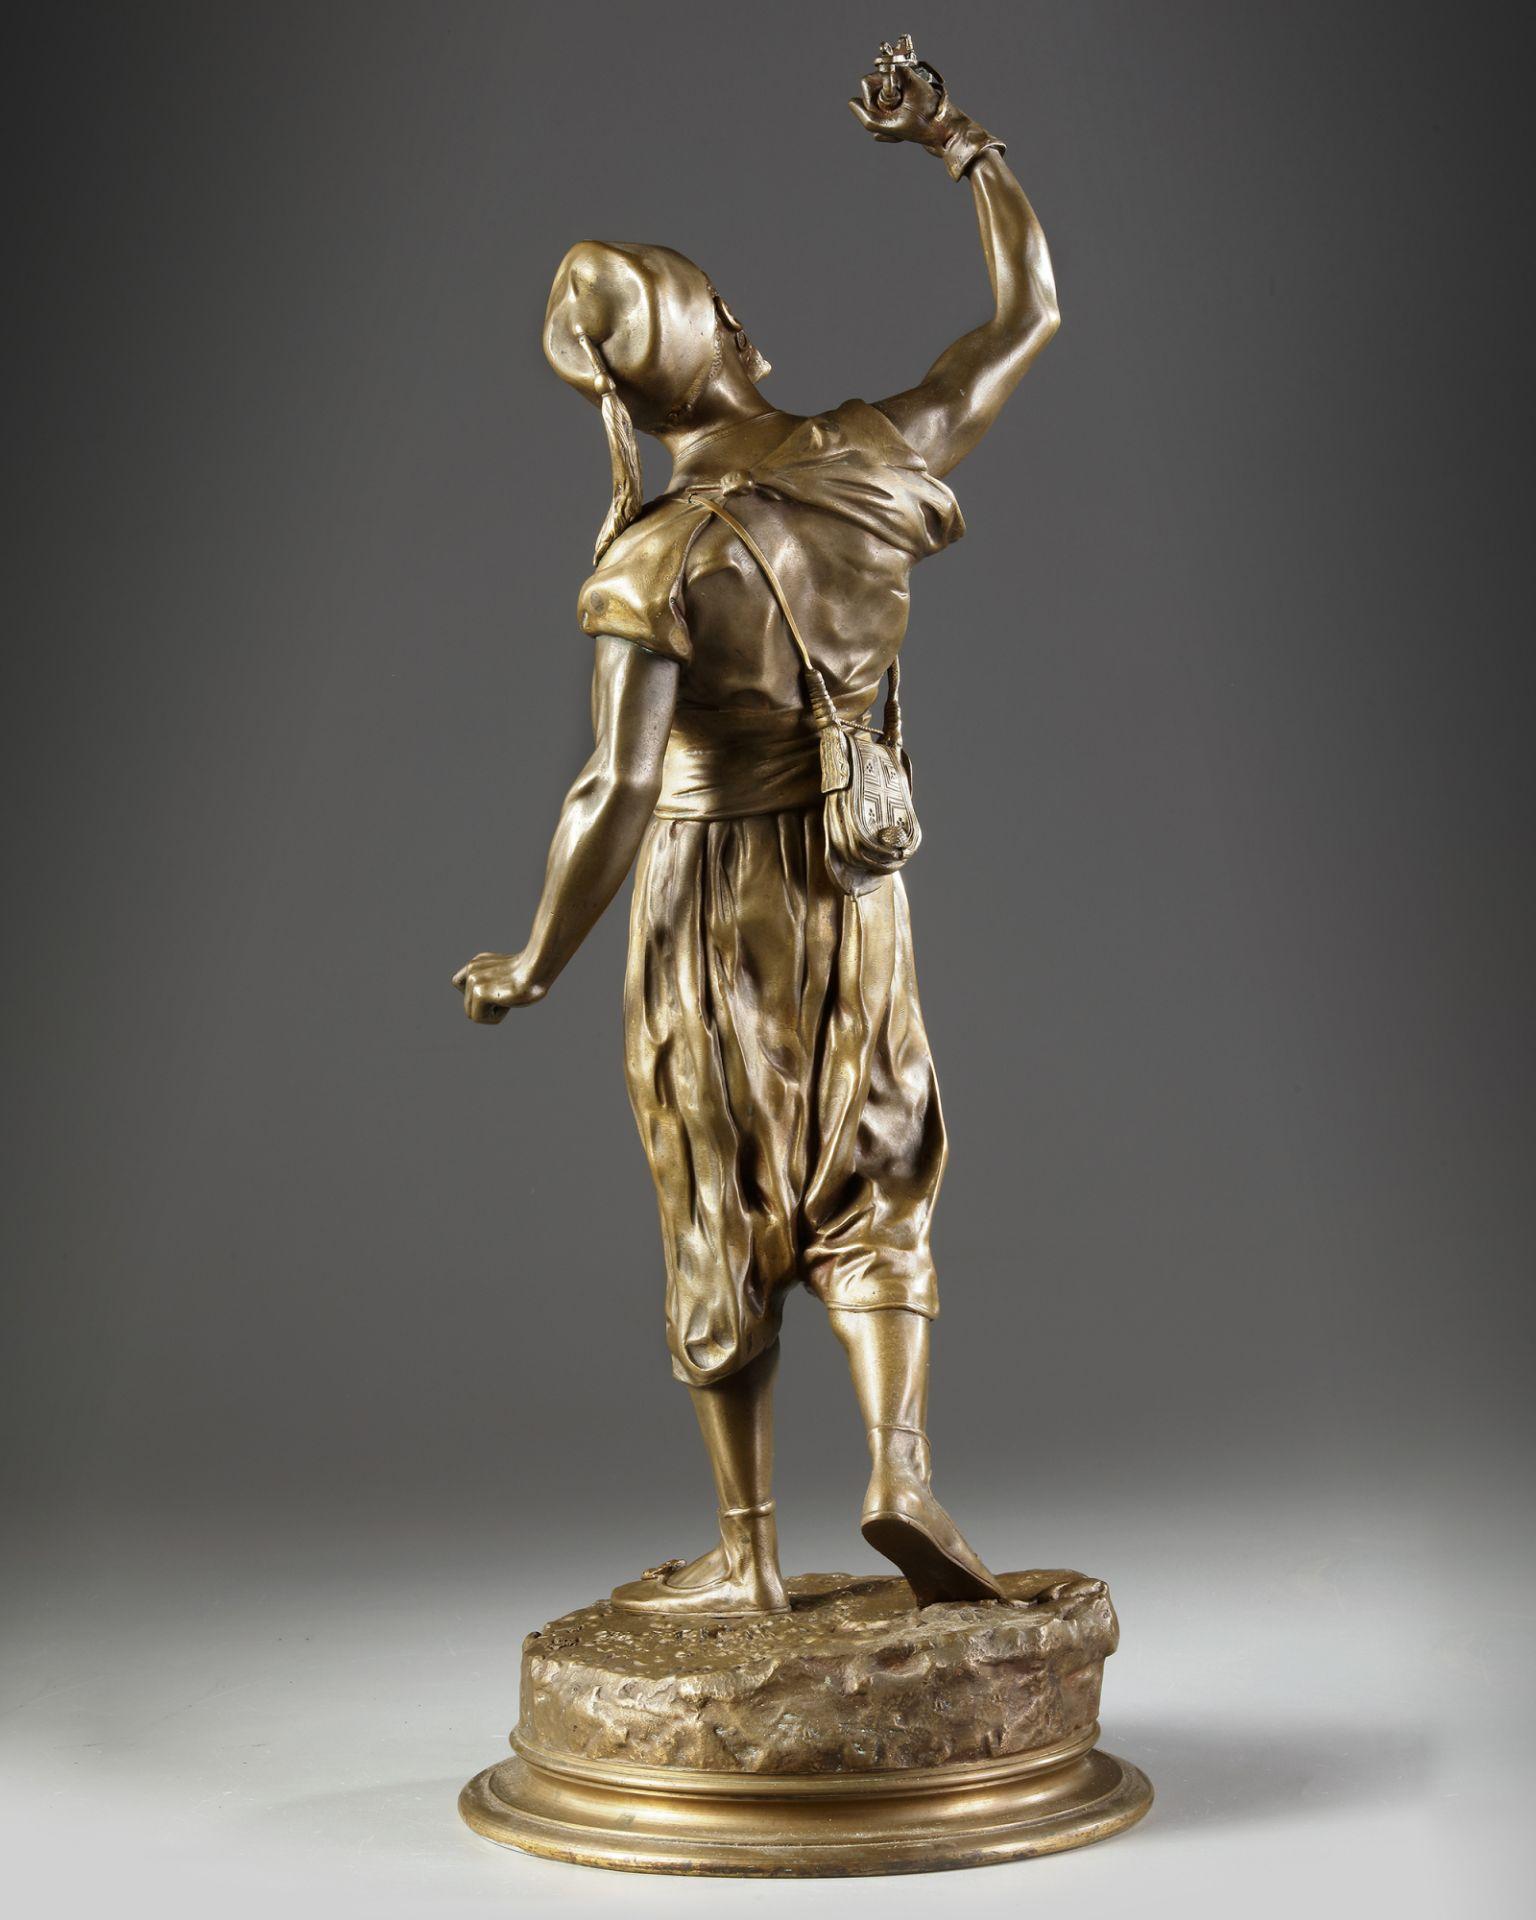 A BRONZE FIGURE, JULES MÈNE, 19TH CENTURY - Image 2 of 4